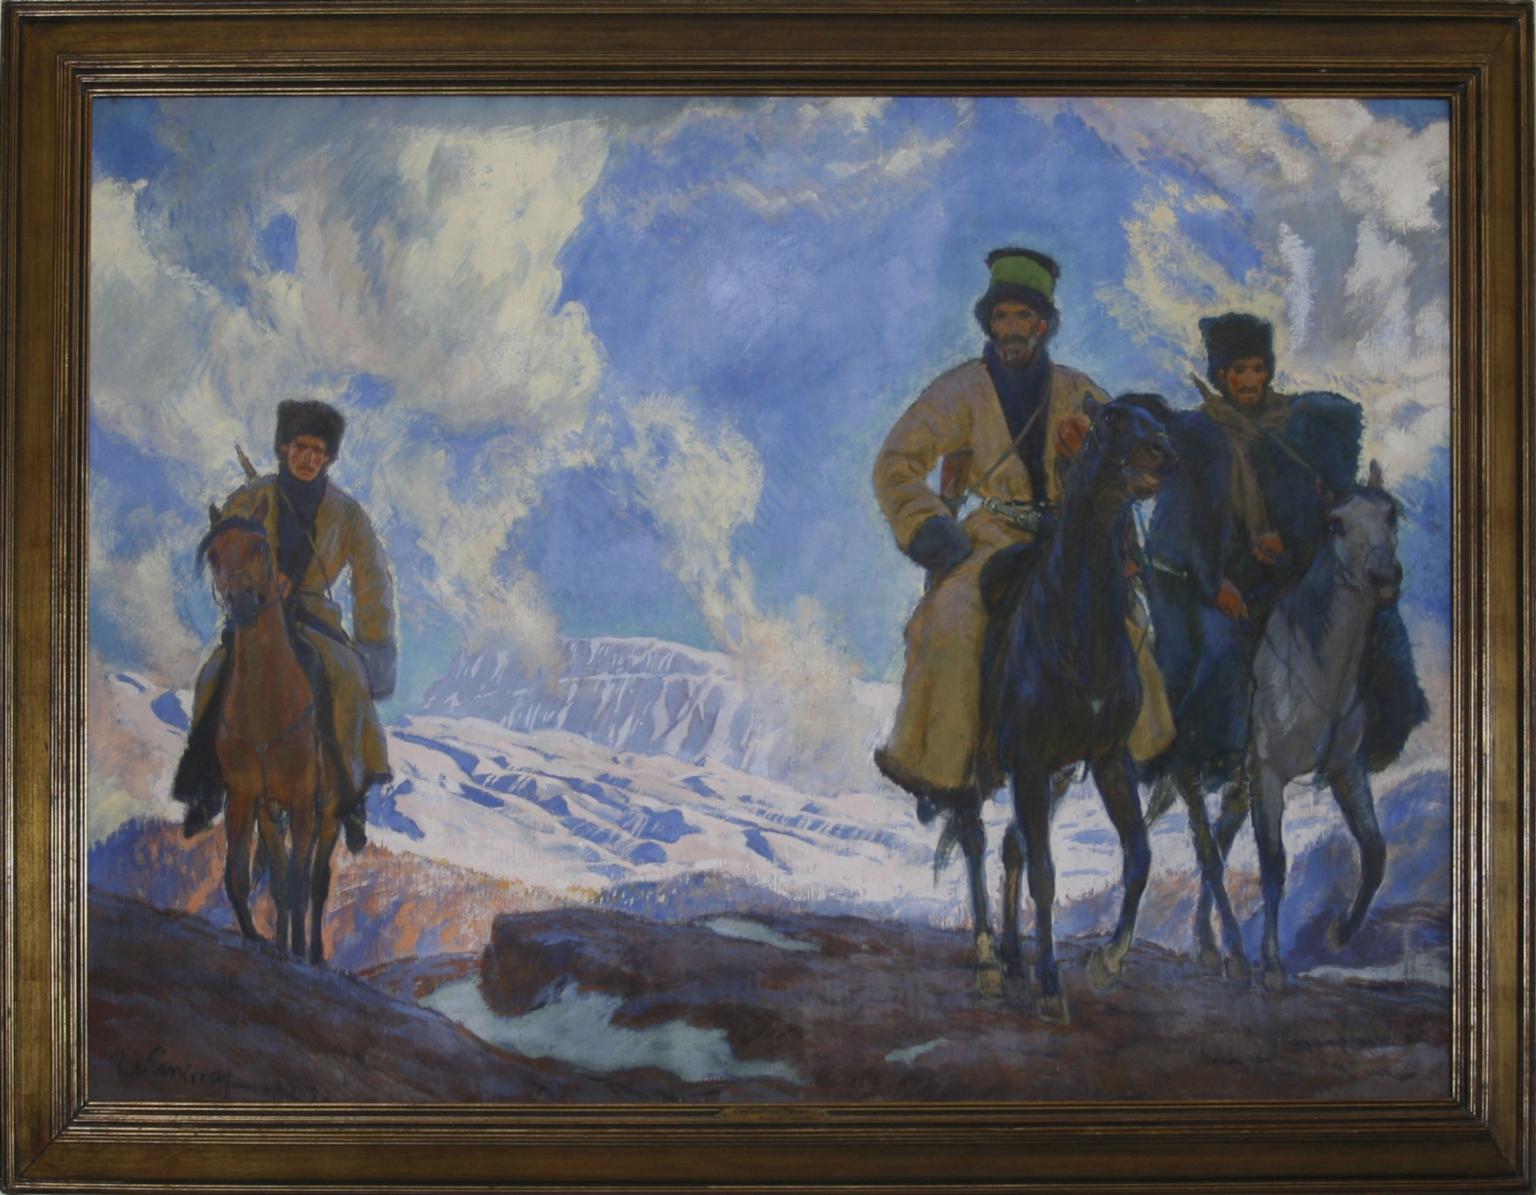 Dagestan Types Cossacks